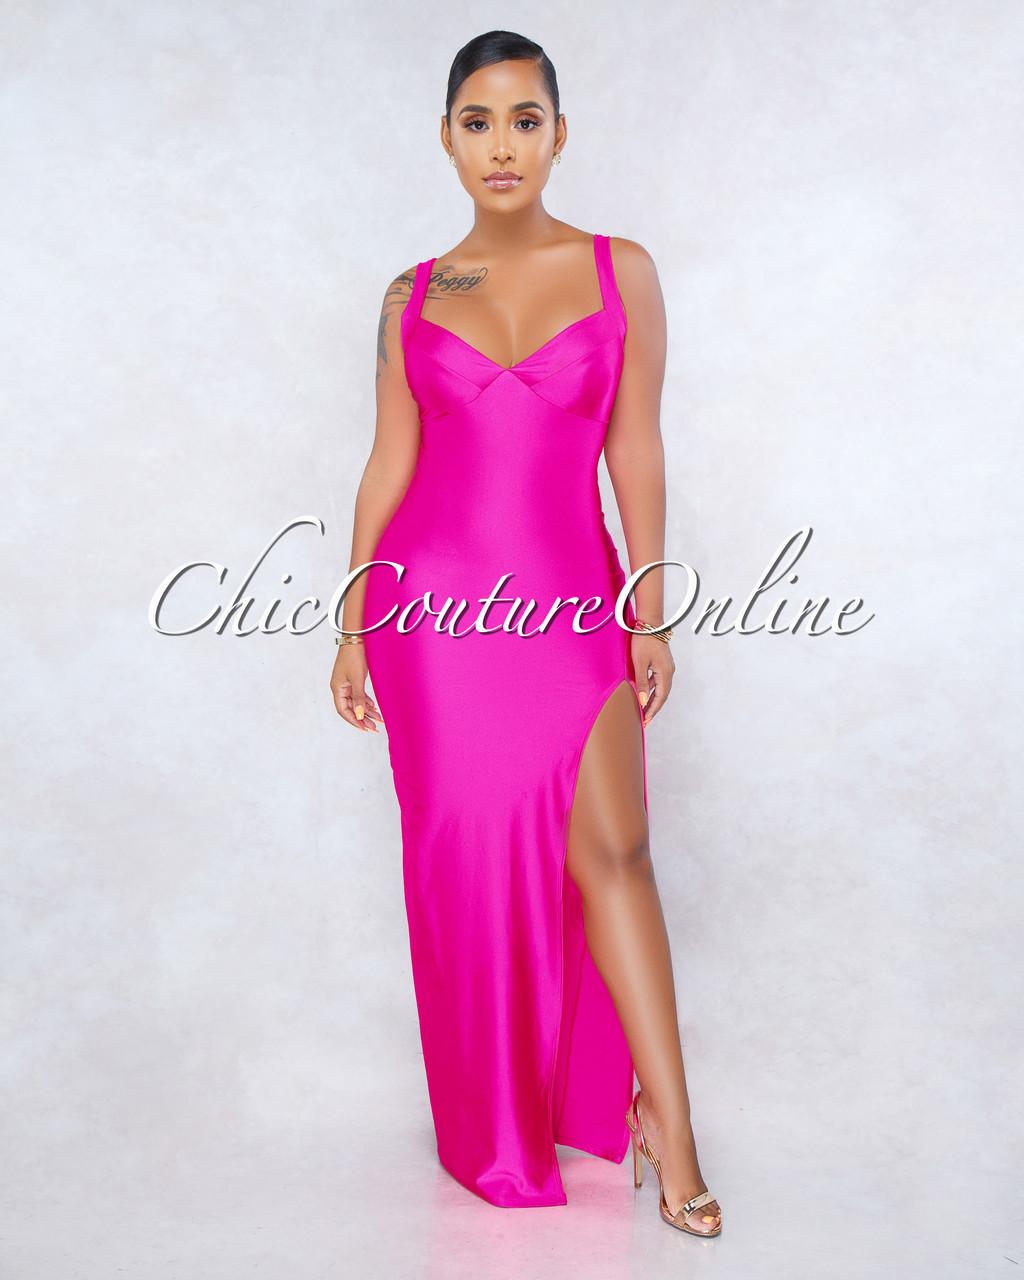 eca523dba10cc ... Front Slit Padded Maxi Dress. Price: $50.00. Image 1